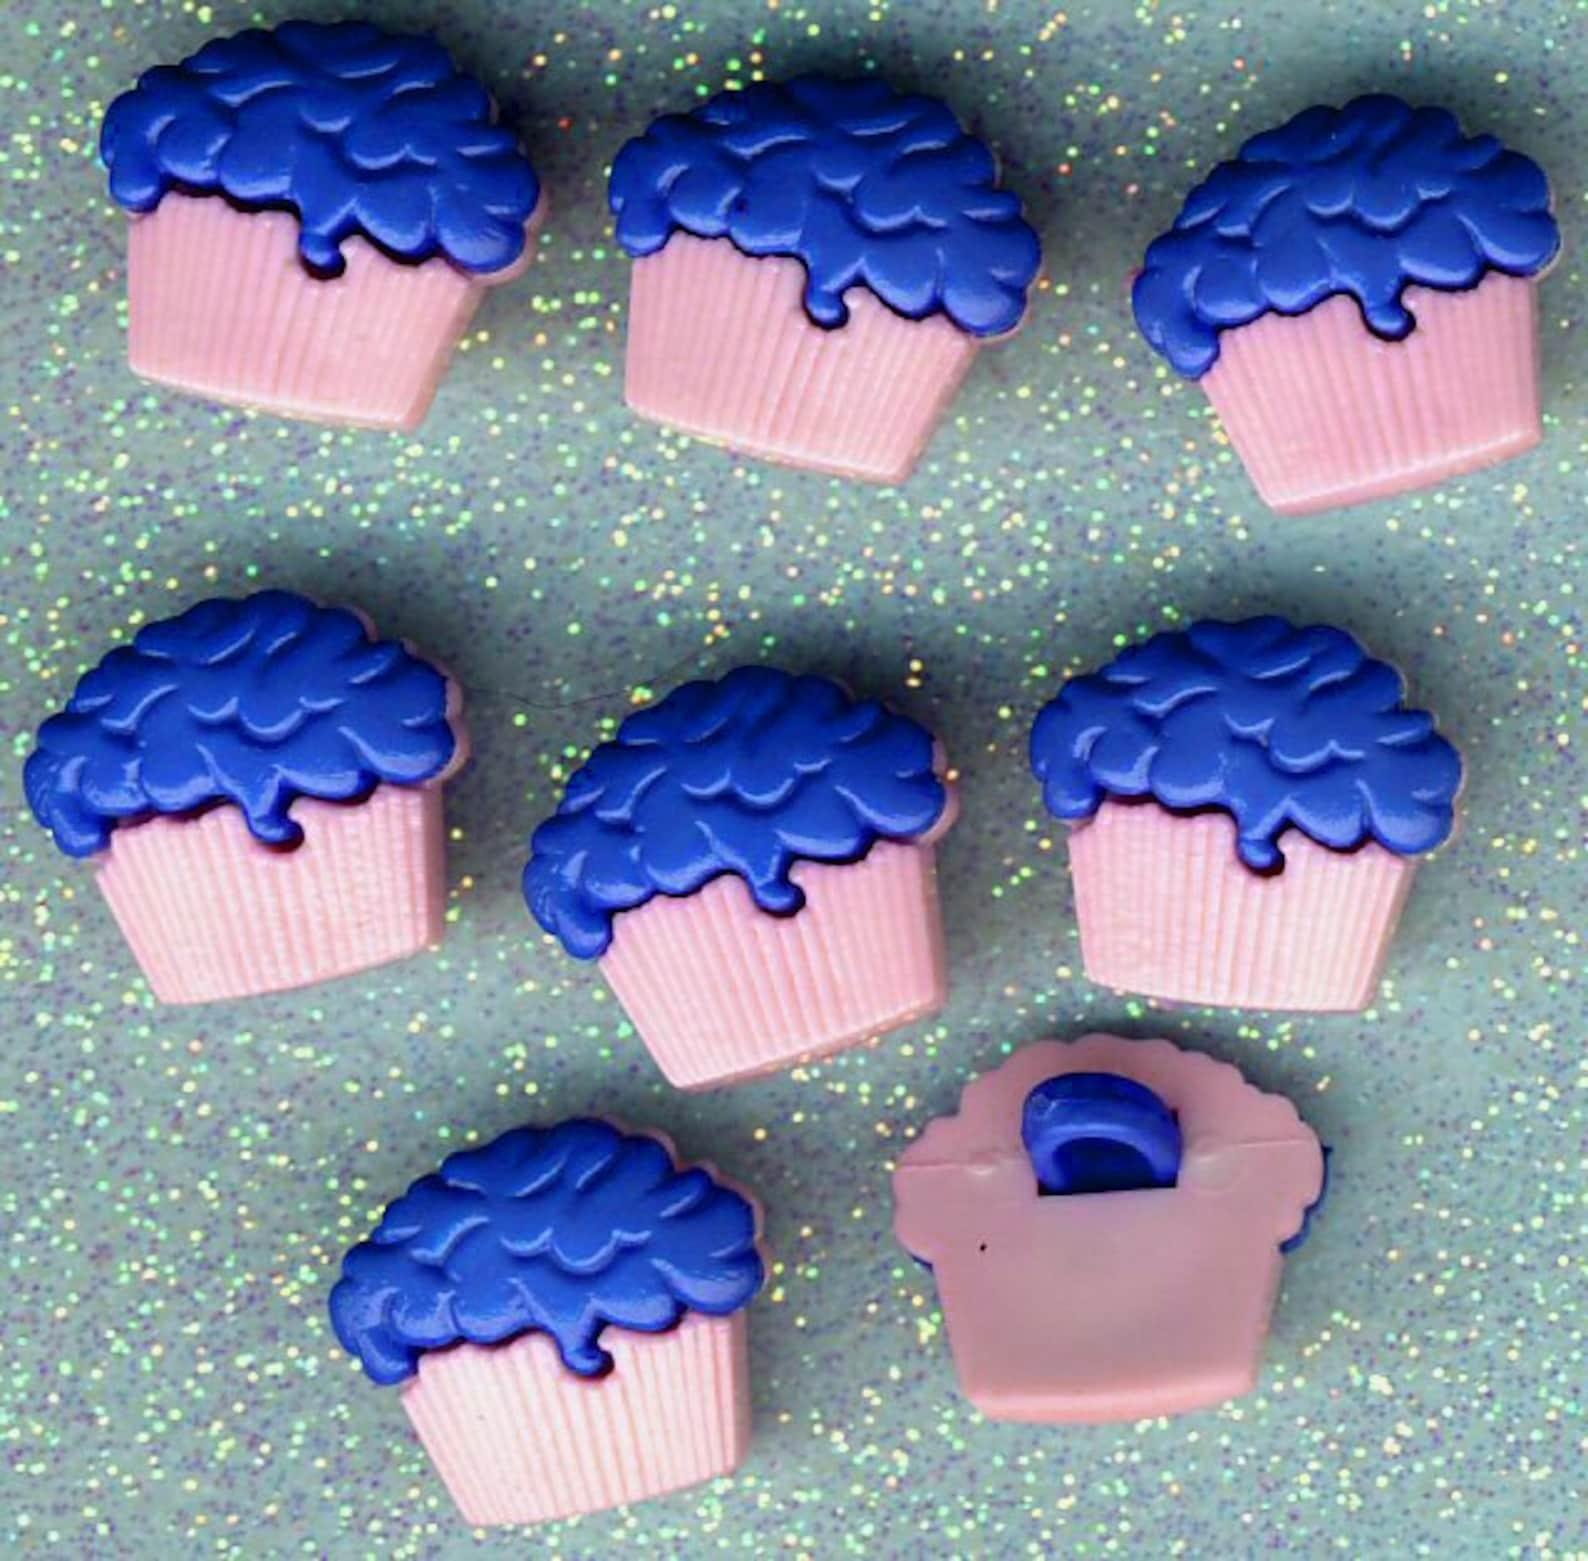 Caja PINK y BLUEBERRY TOPPING Cupcake Pastel de Hada ...